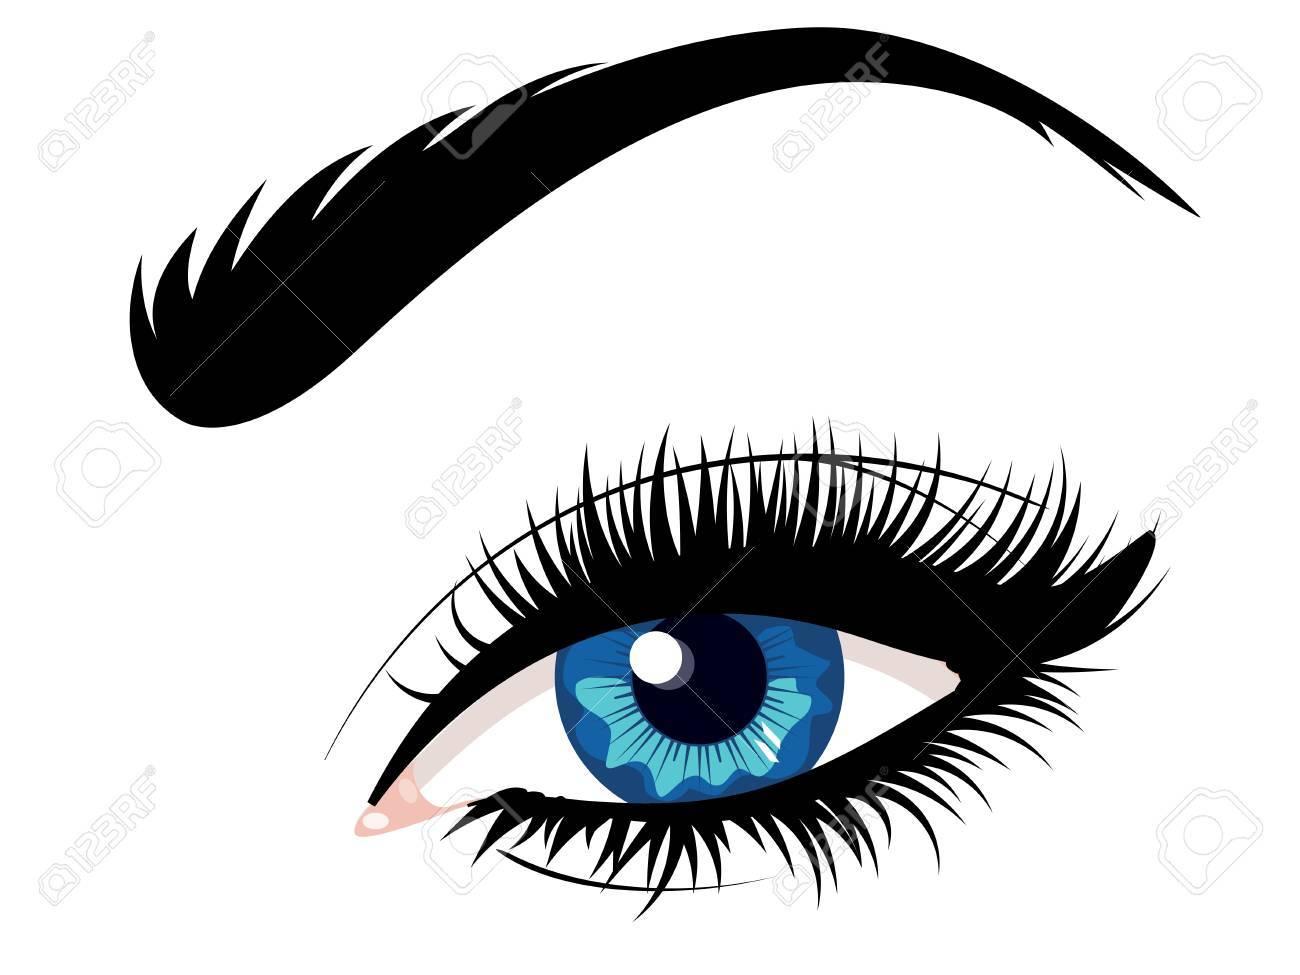 Cartoon female eye of blue color with eyebrow illustration stock vector 72414614